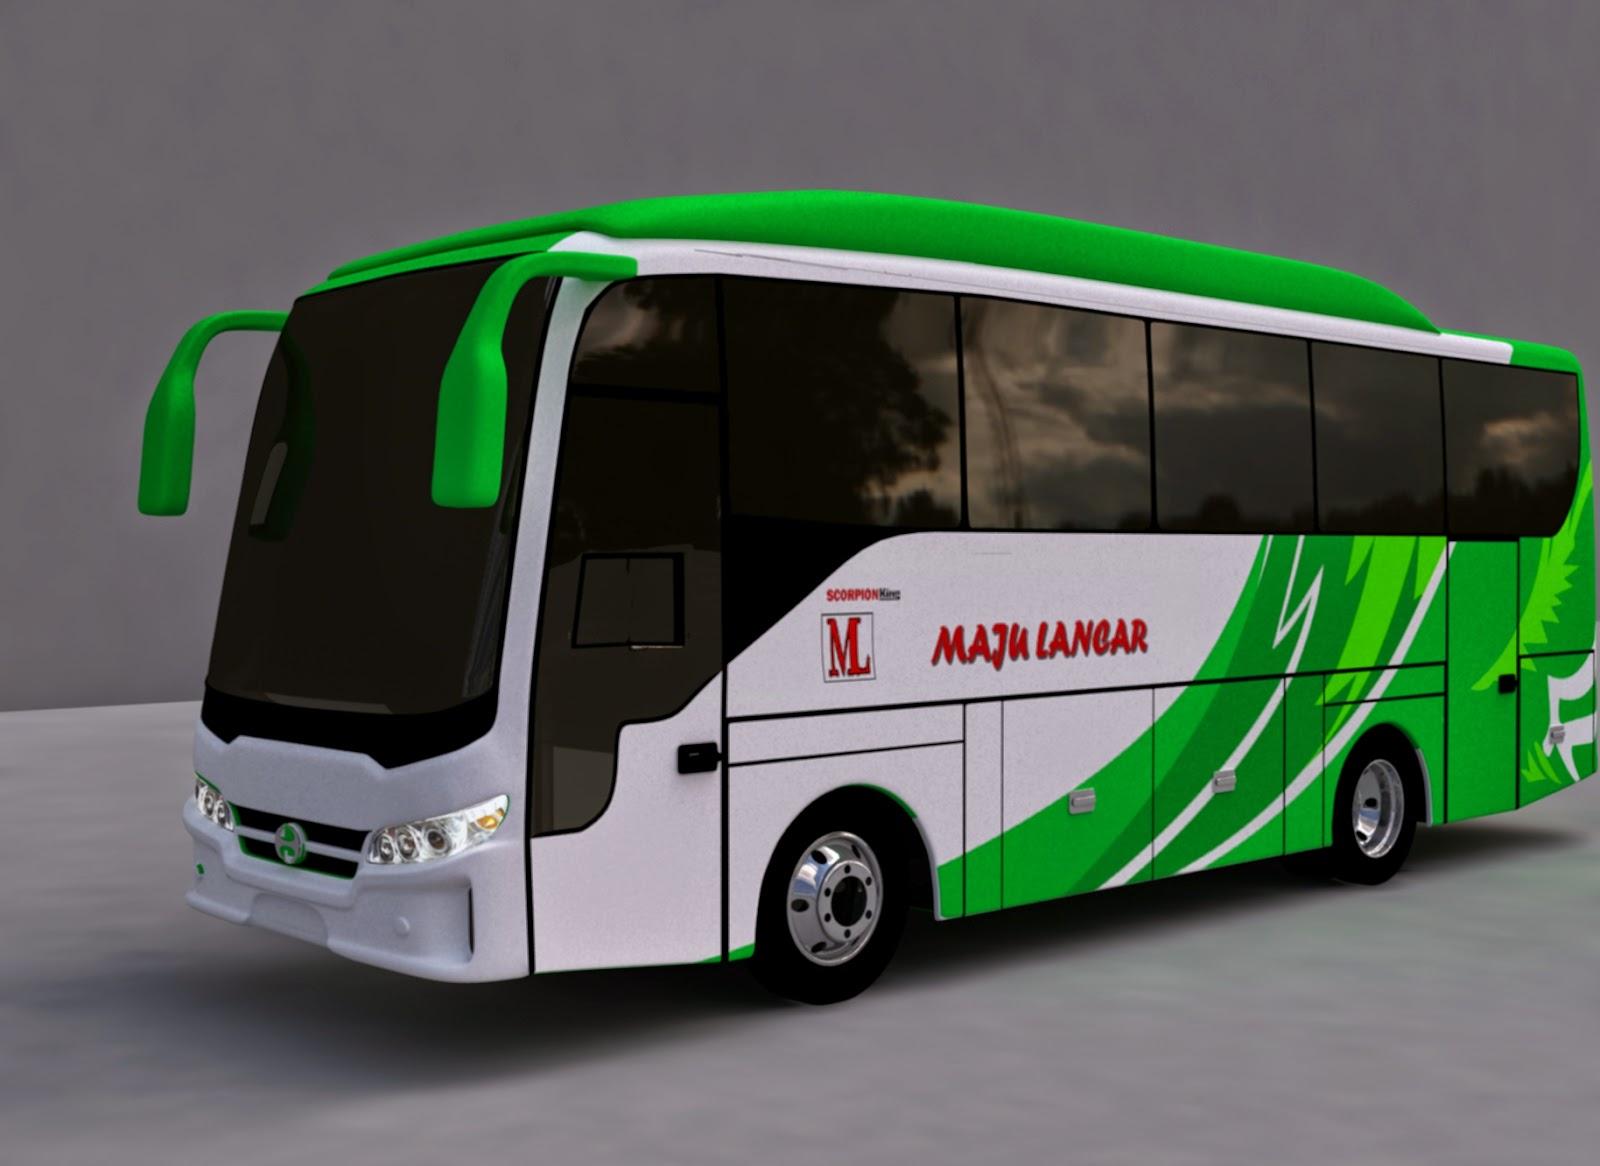 Design bus BEAT MD PO Maju Lancar